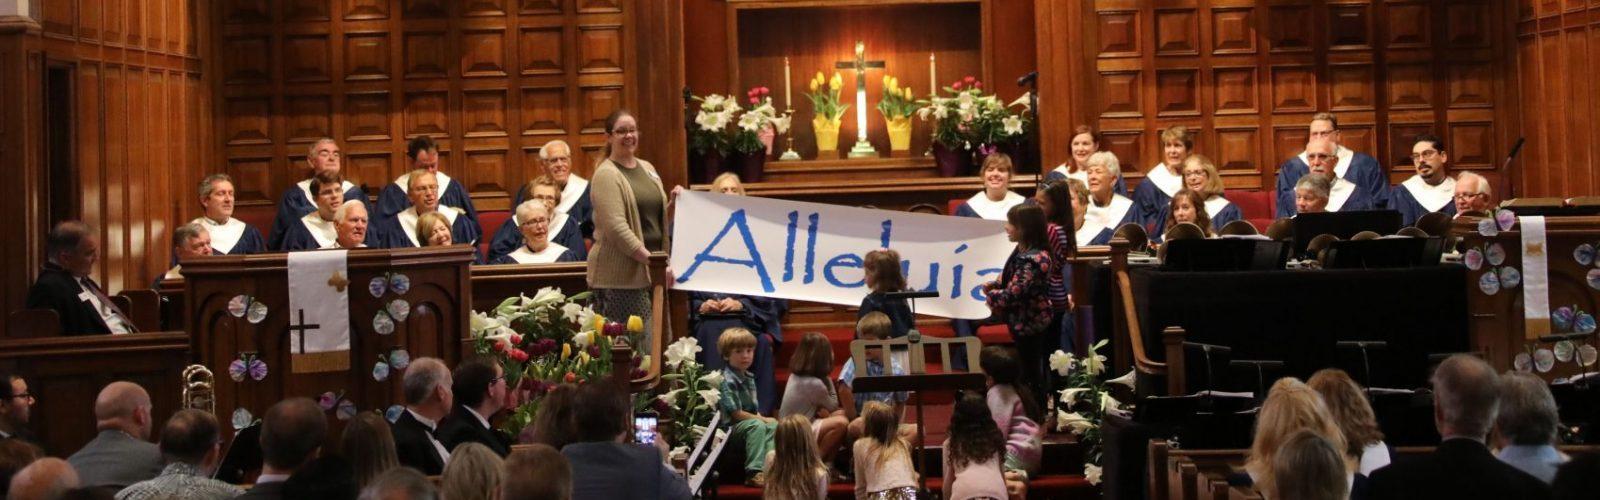 Alleluia banner Easter Sunday